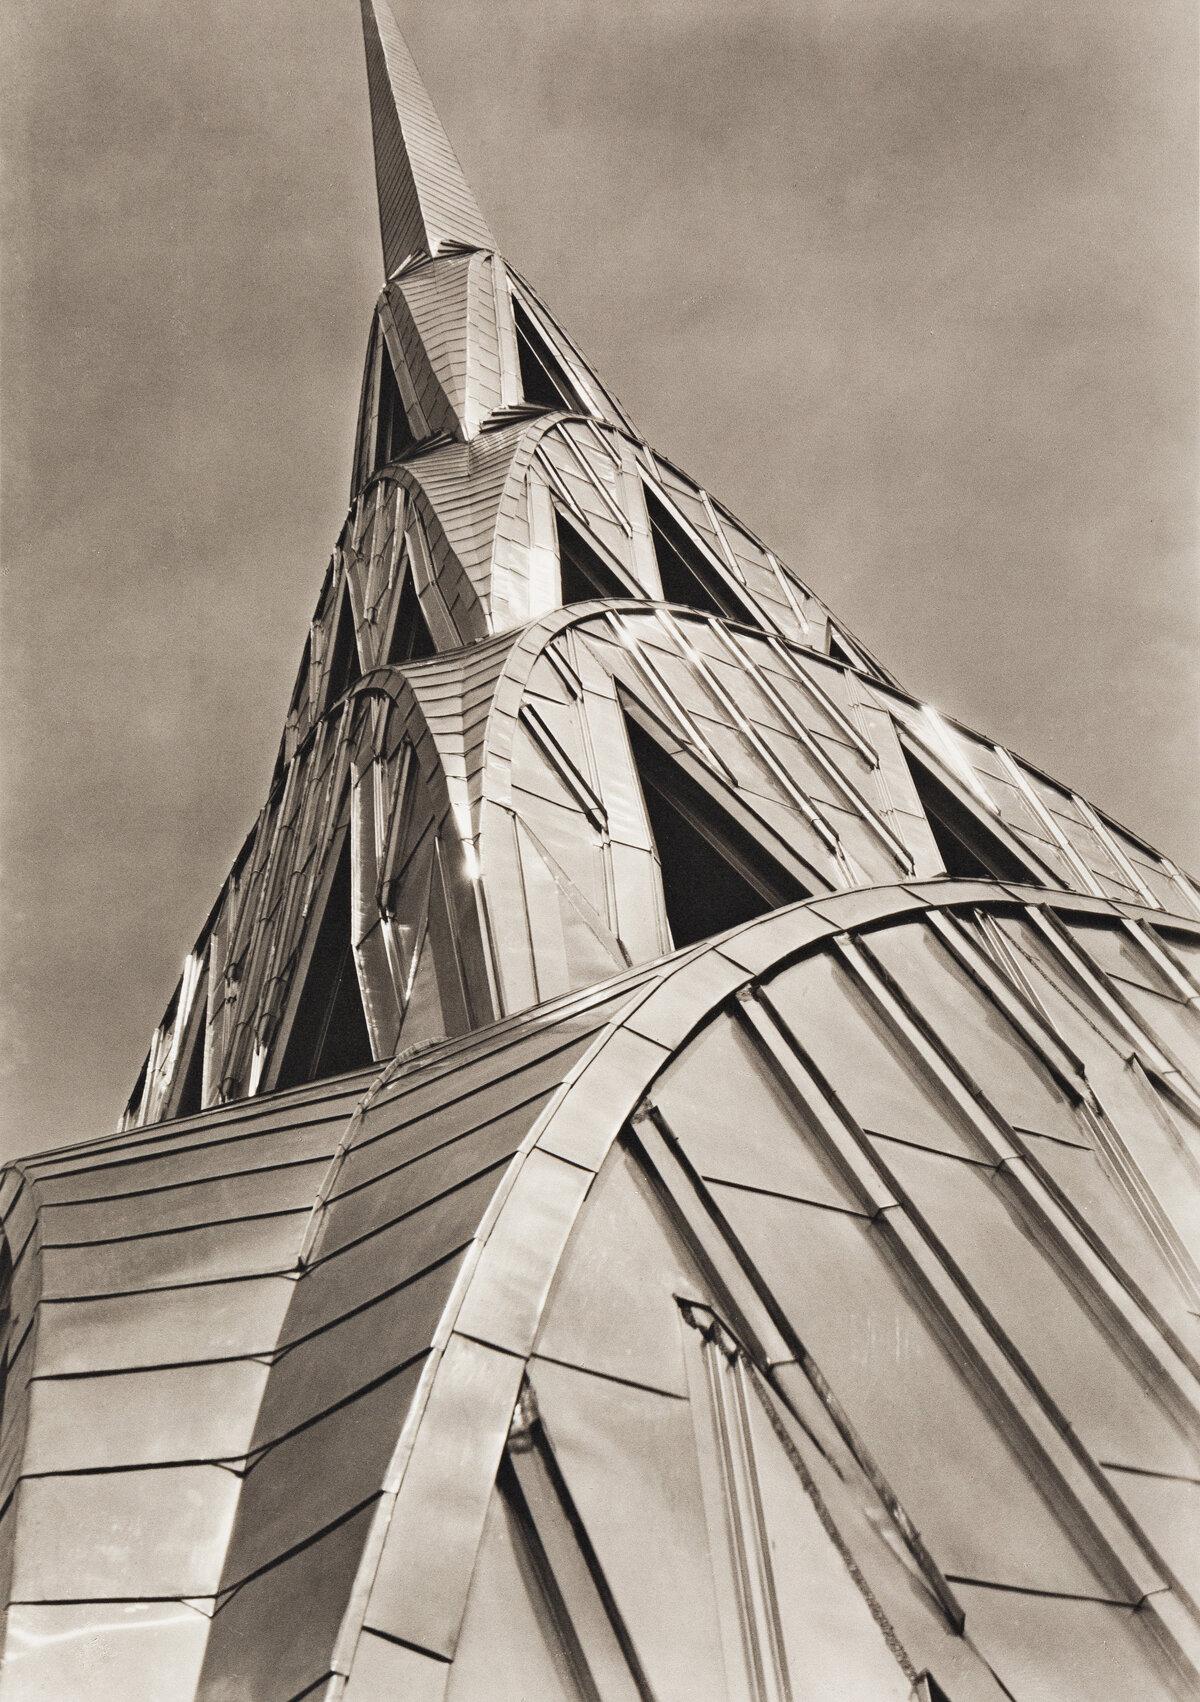 LiveAuctionTalk.com | Margaret Bourke-White Photography as Art